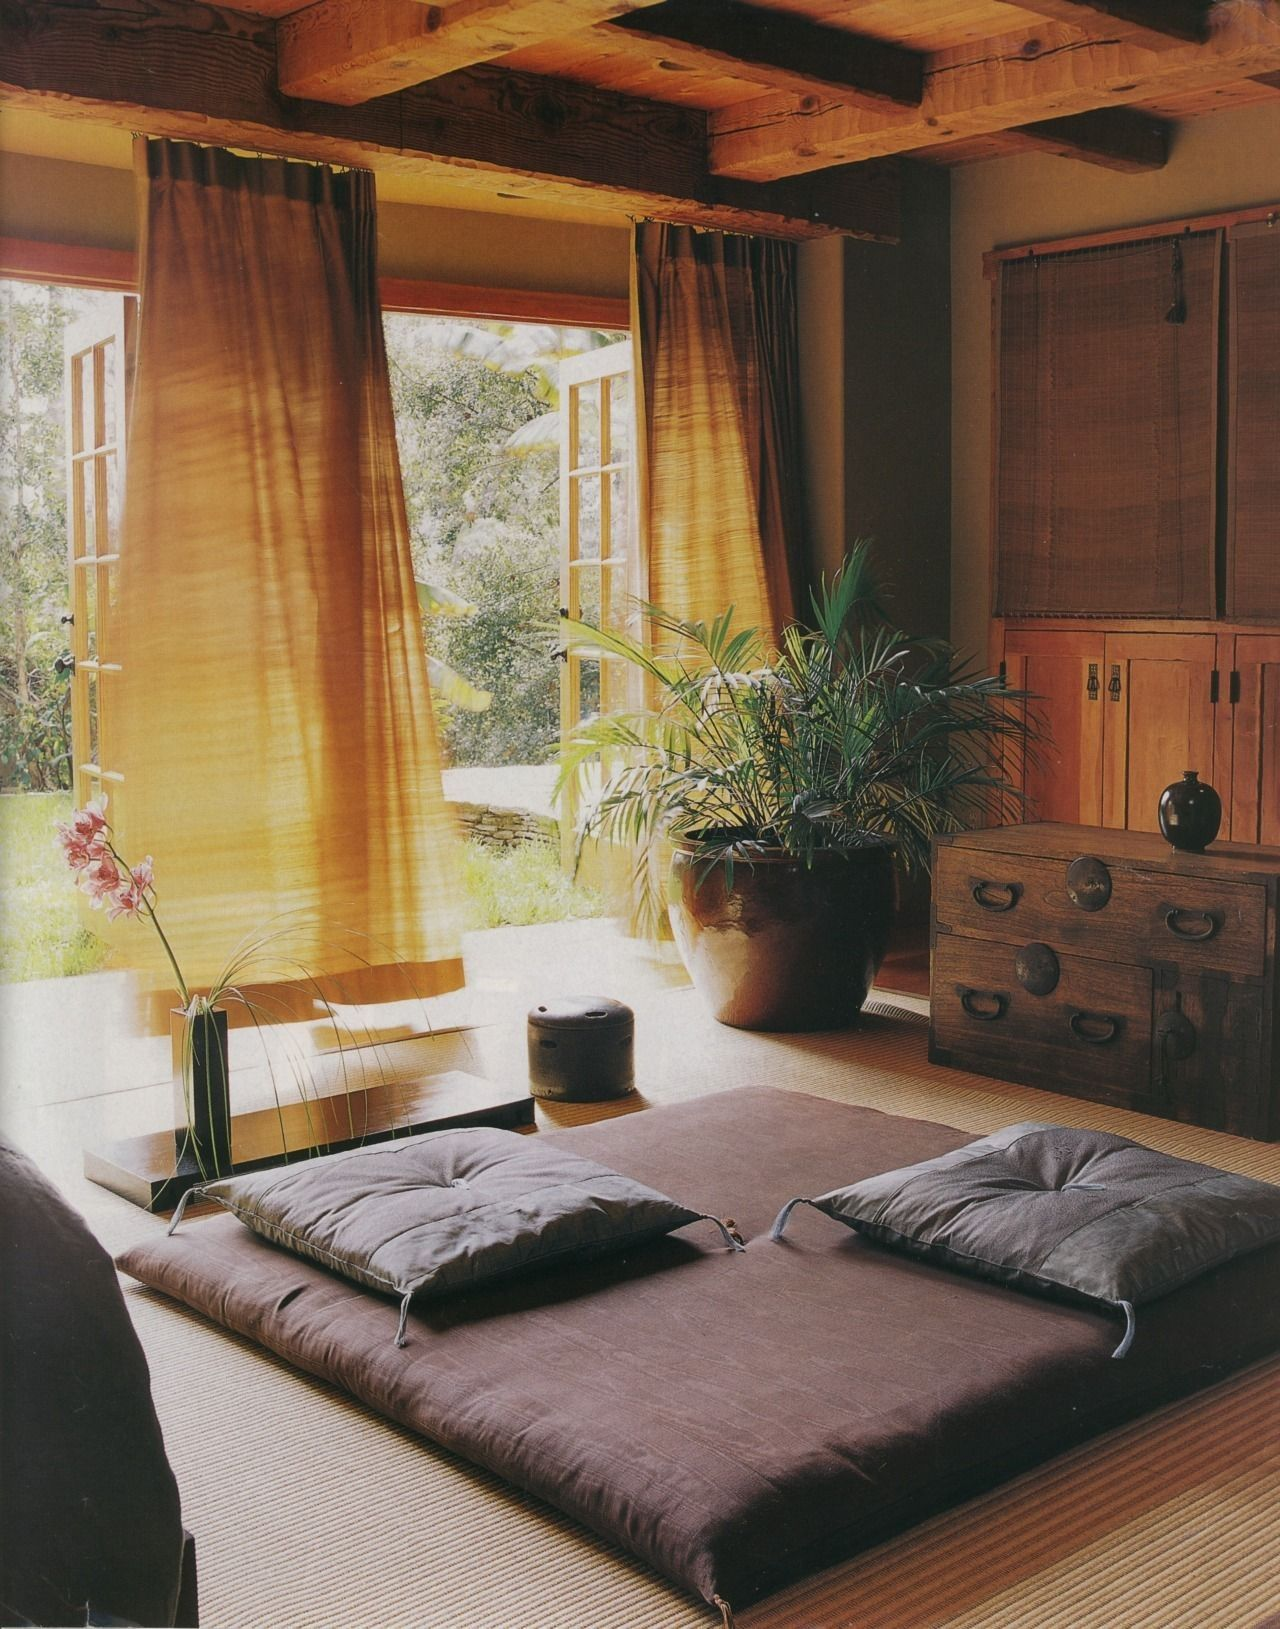 Image result for meditation space deco in pinterest